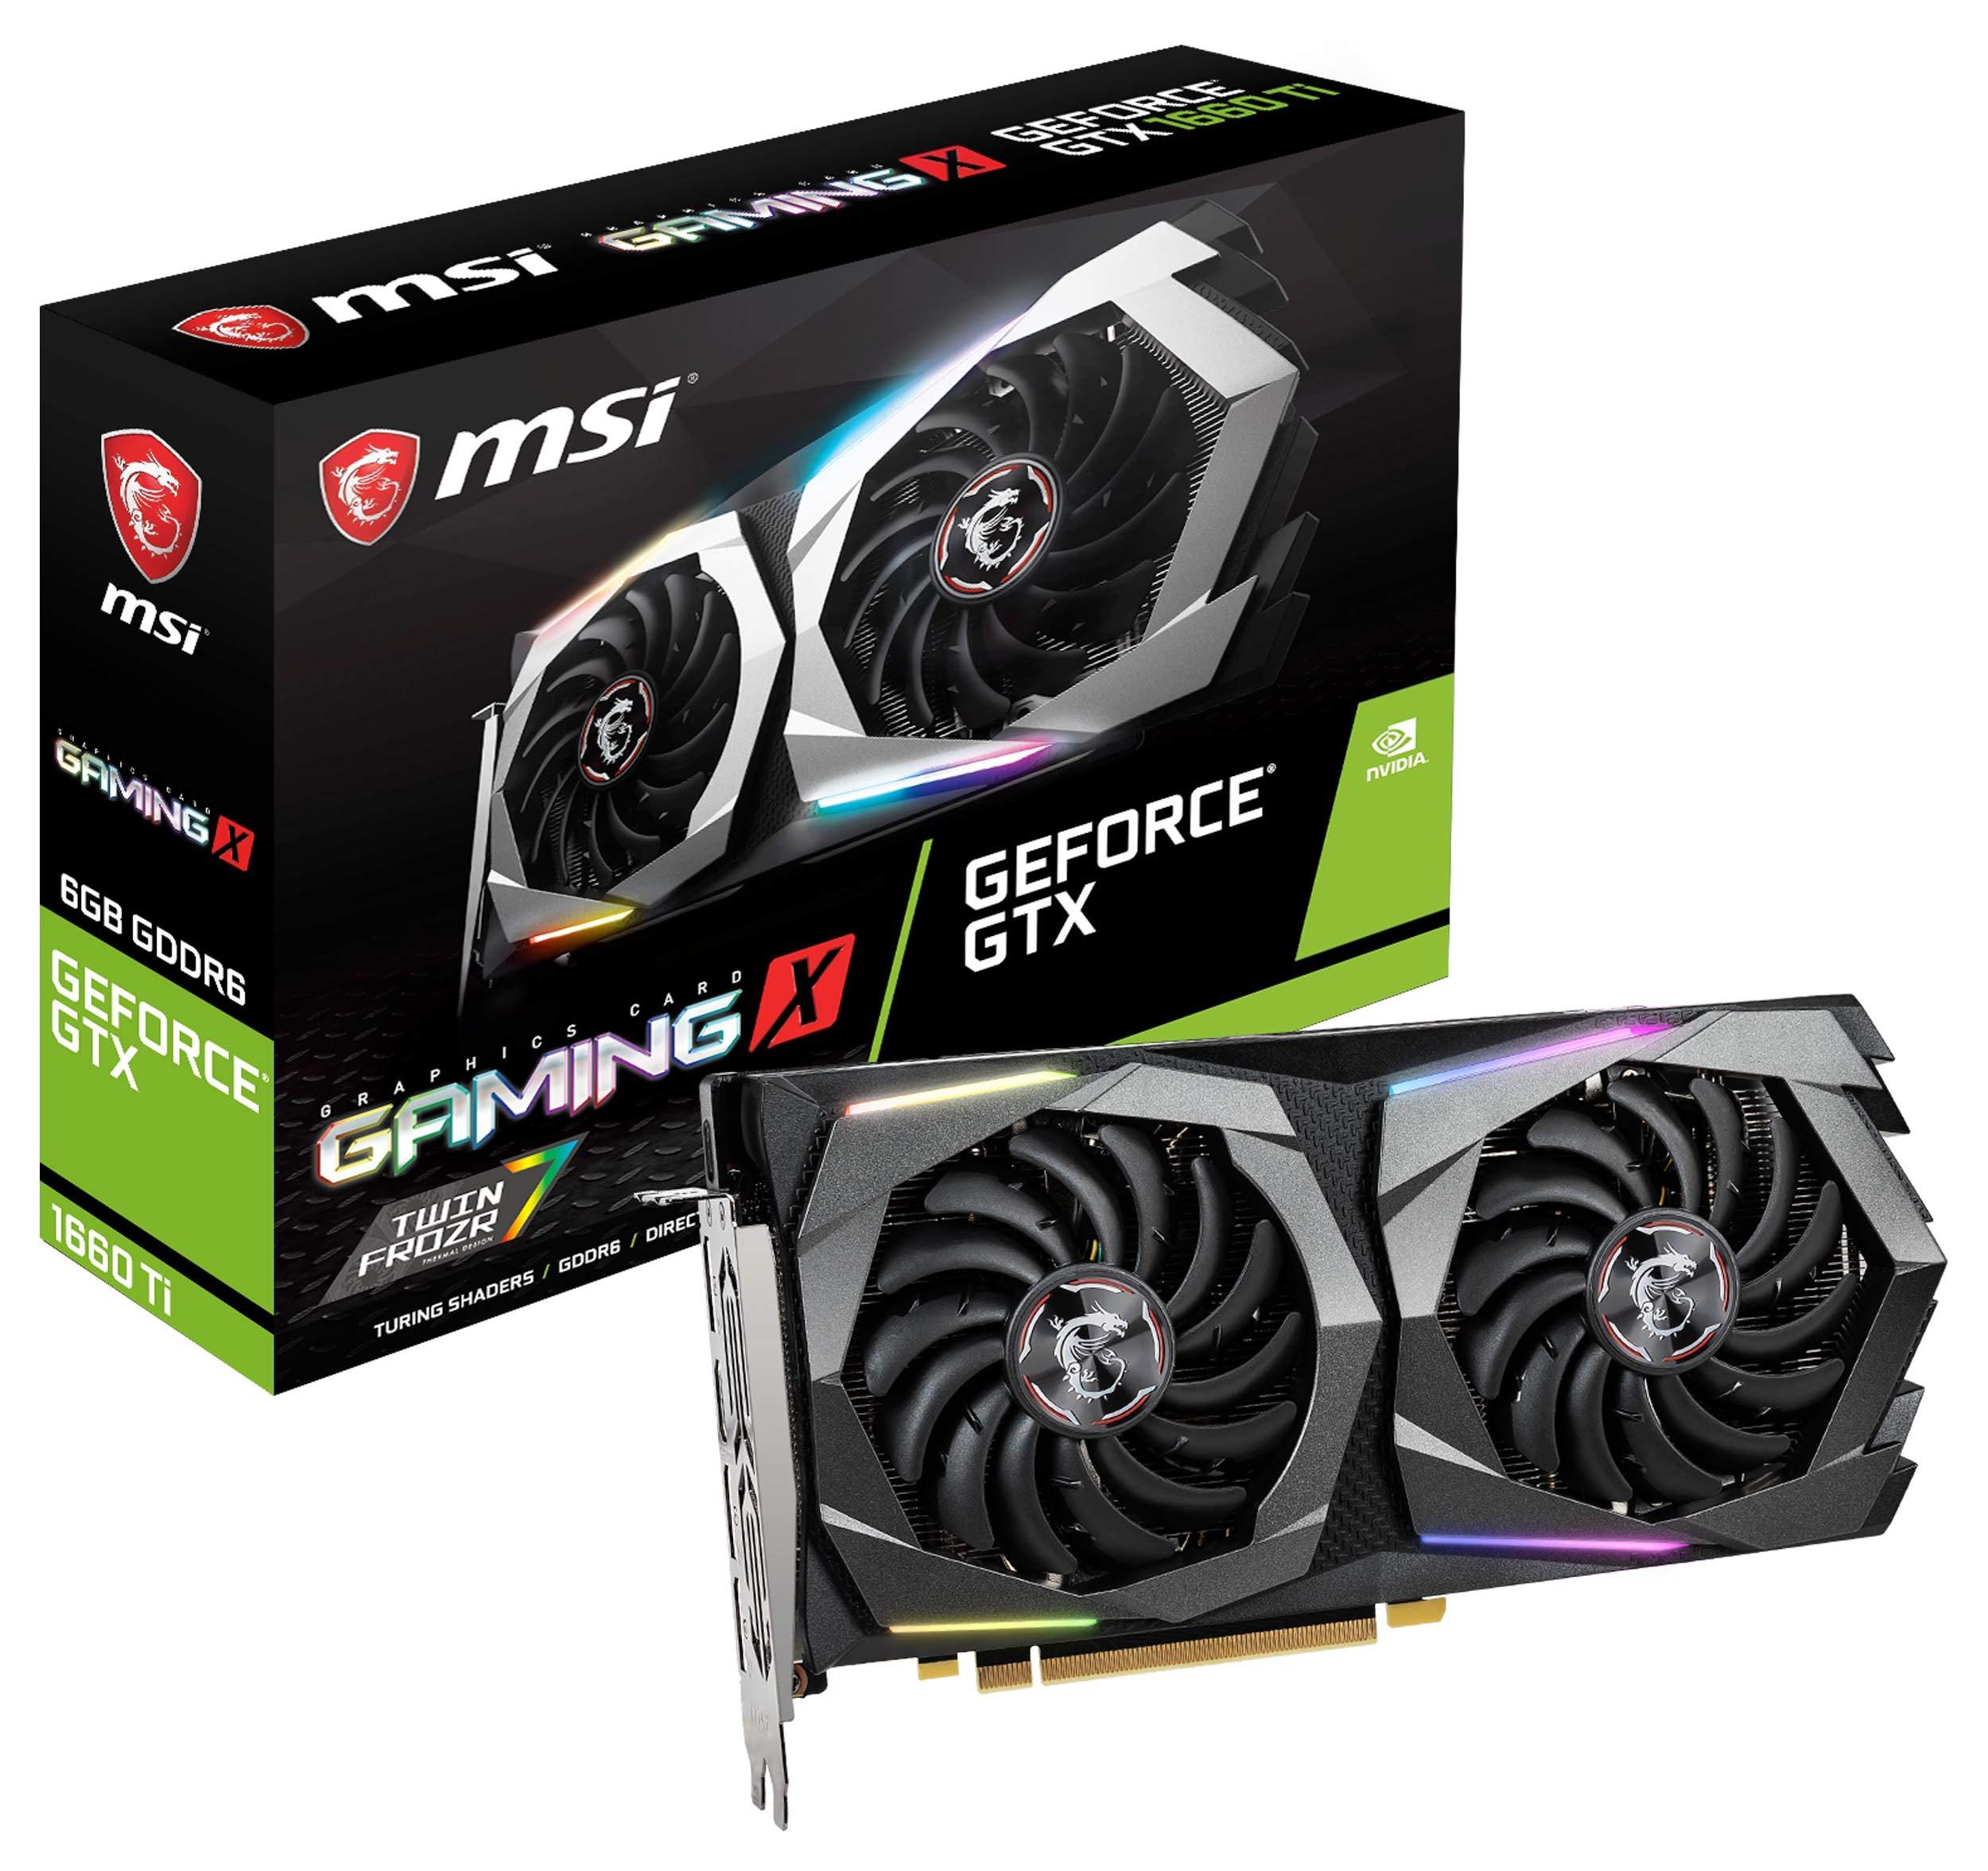 MSI Gaming GeForce GTX 1660 Ti 192-bit HDMI/DP 6GB GDRR6 HDCP Support DirectX 12 Dual Fan VR Ready OC Graphics Card (GTX 1660 TI Gaming X 6G) by MSI